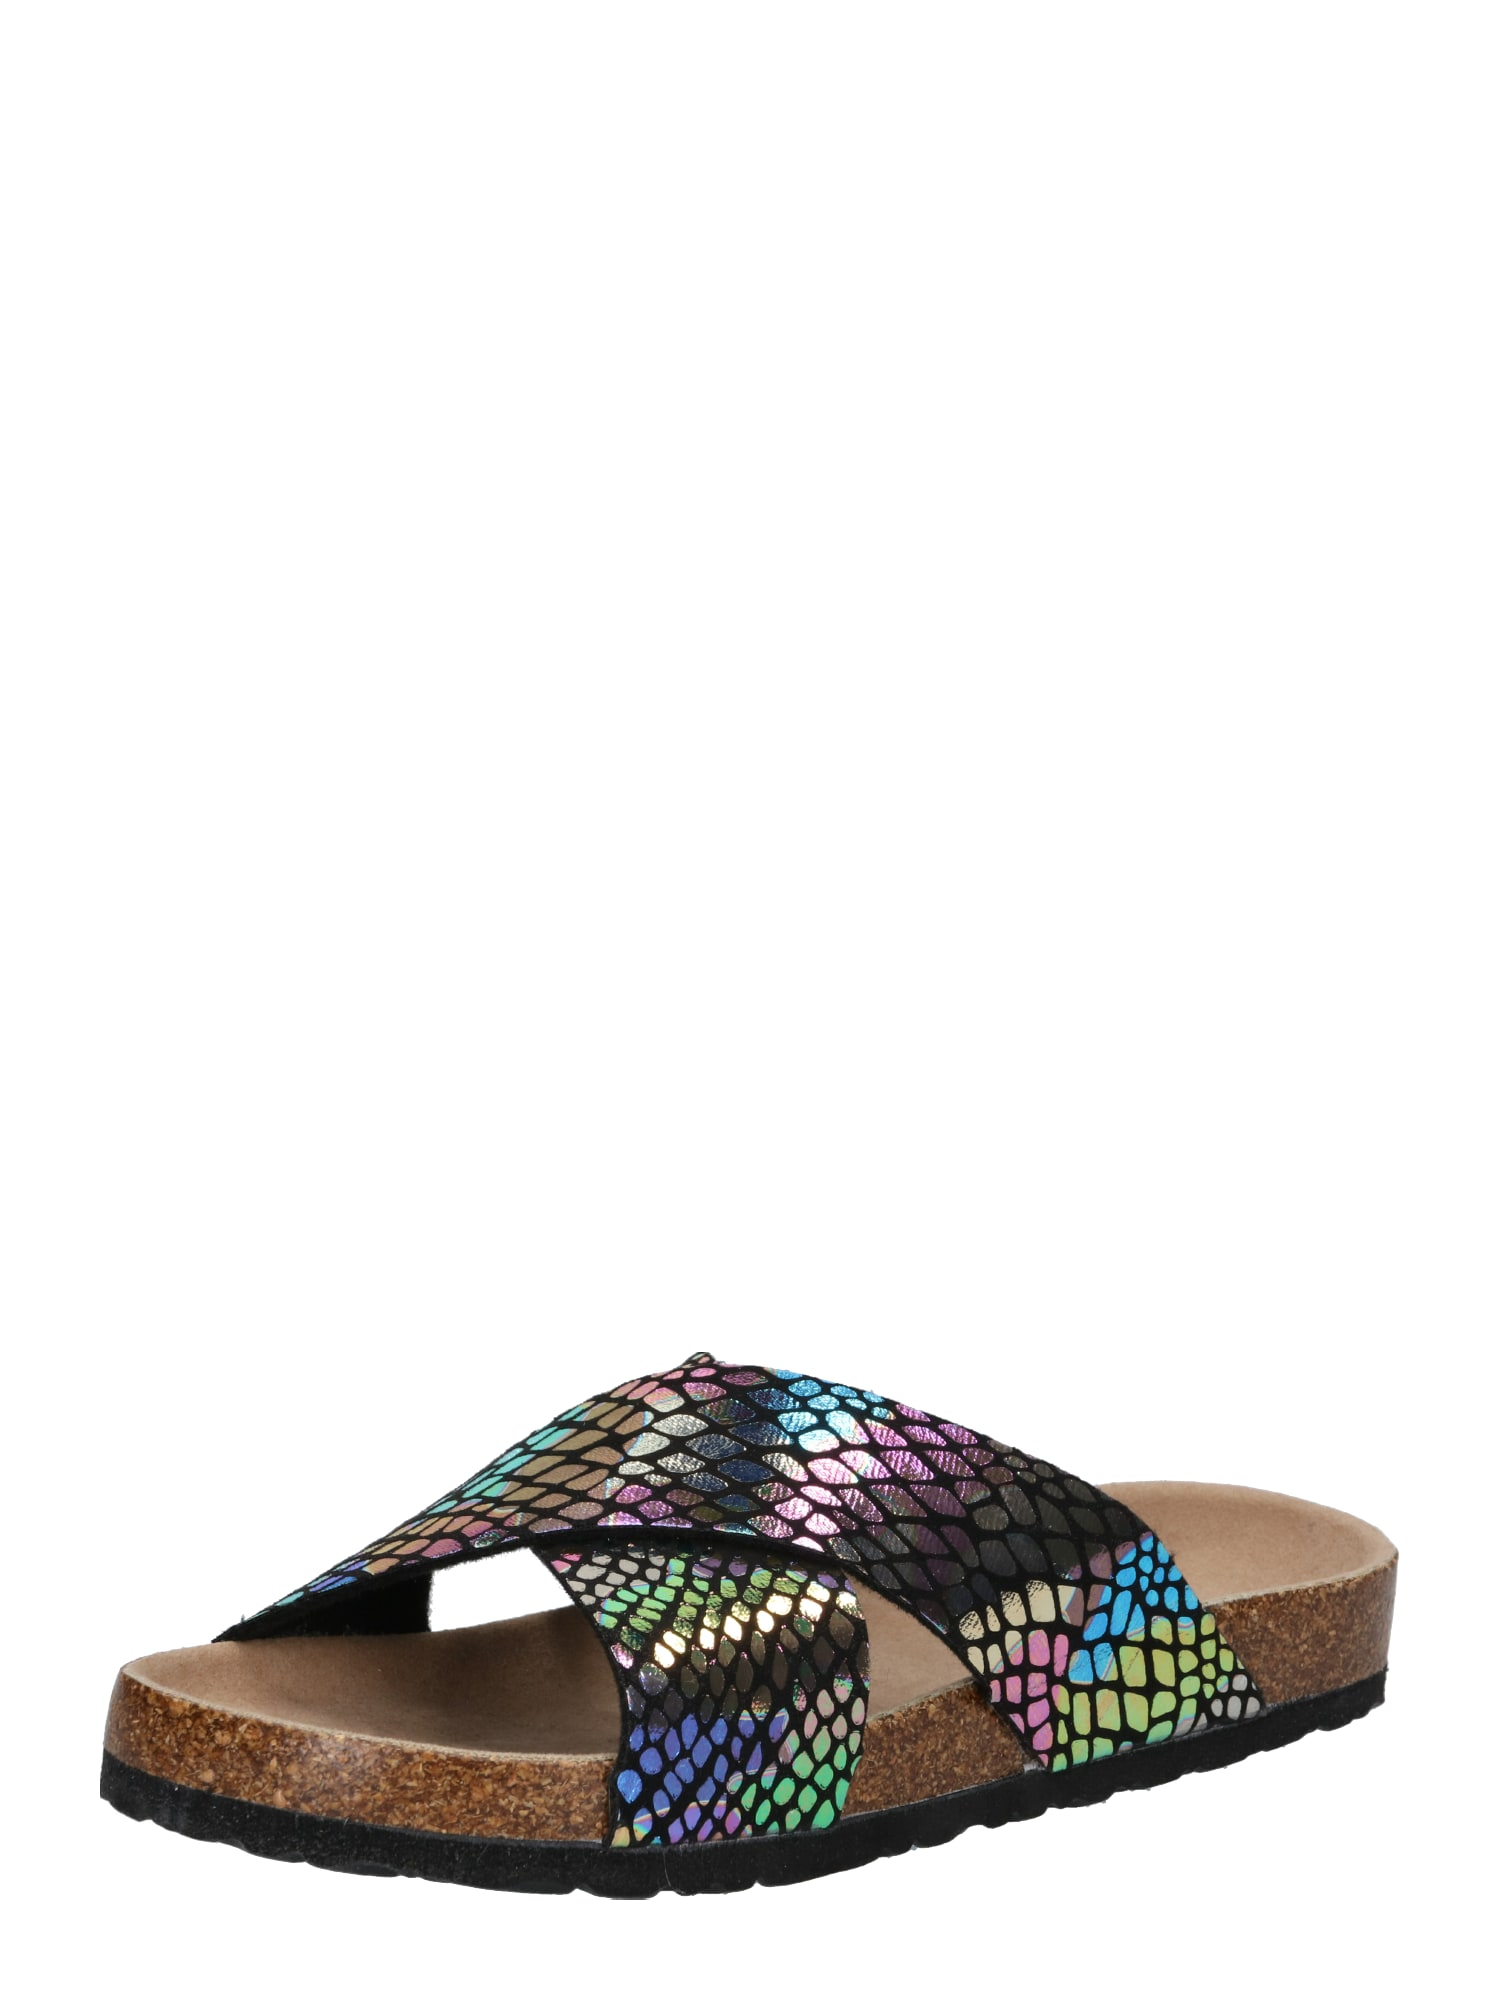 Pantofle SAMIRA mix barev Lost Ink